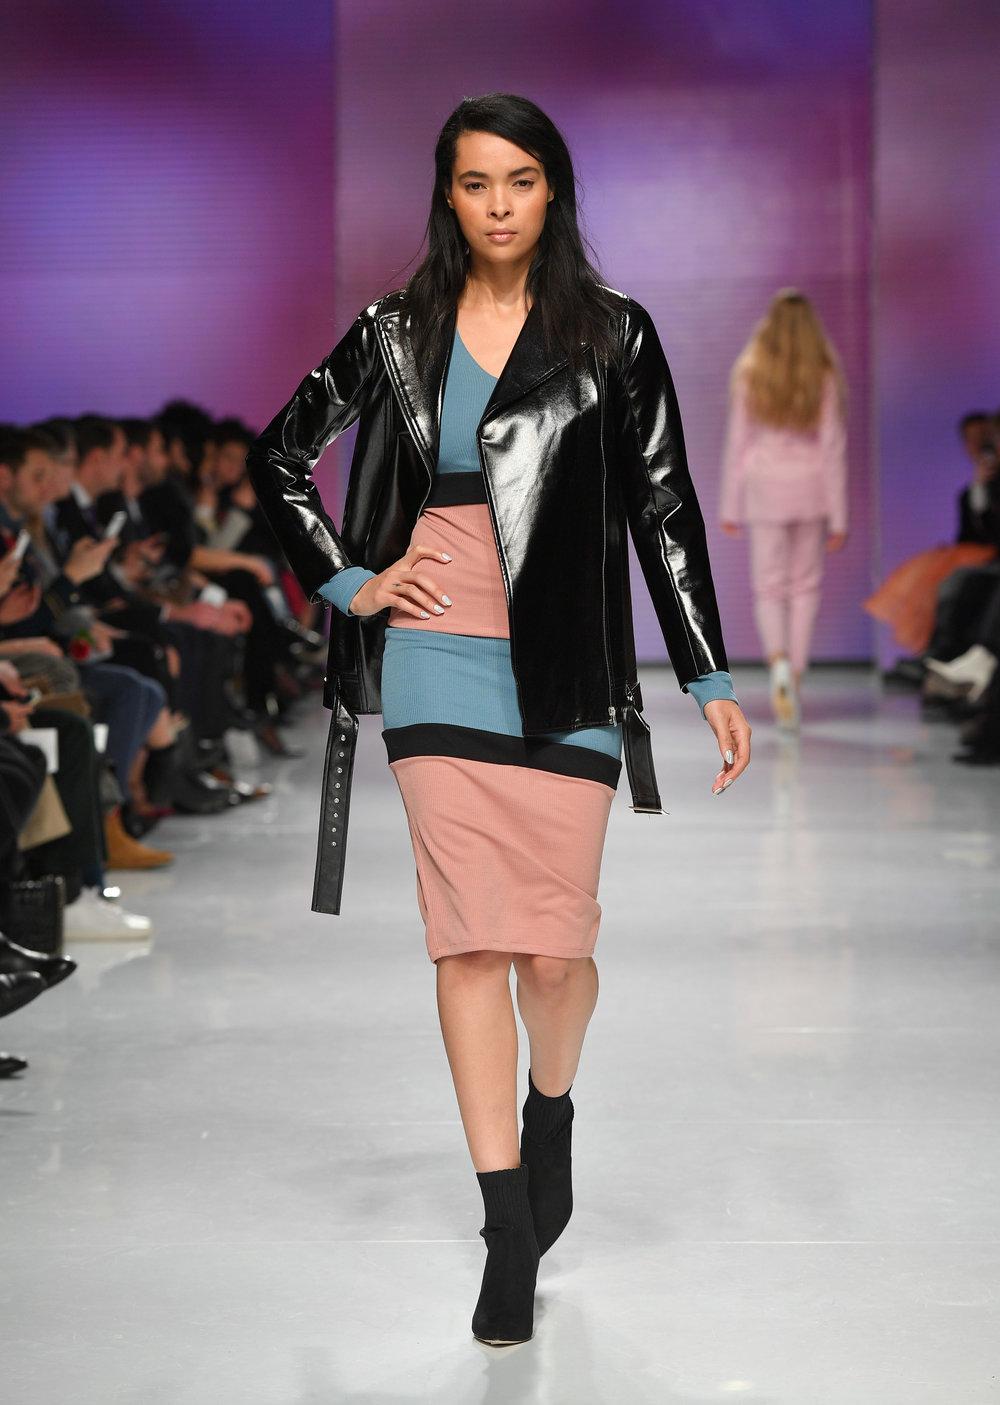 4e218-hilary-macmillan-toronto-fashion-week-february-2018-yorkville-village-7.jpg